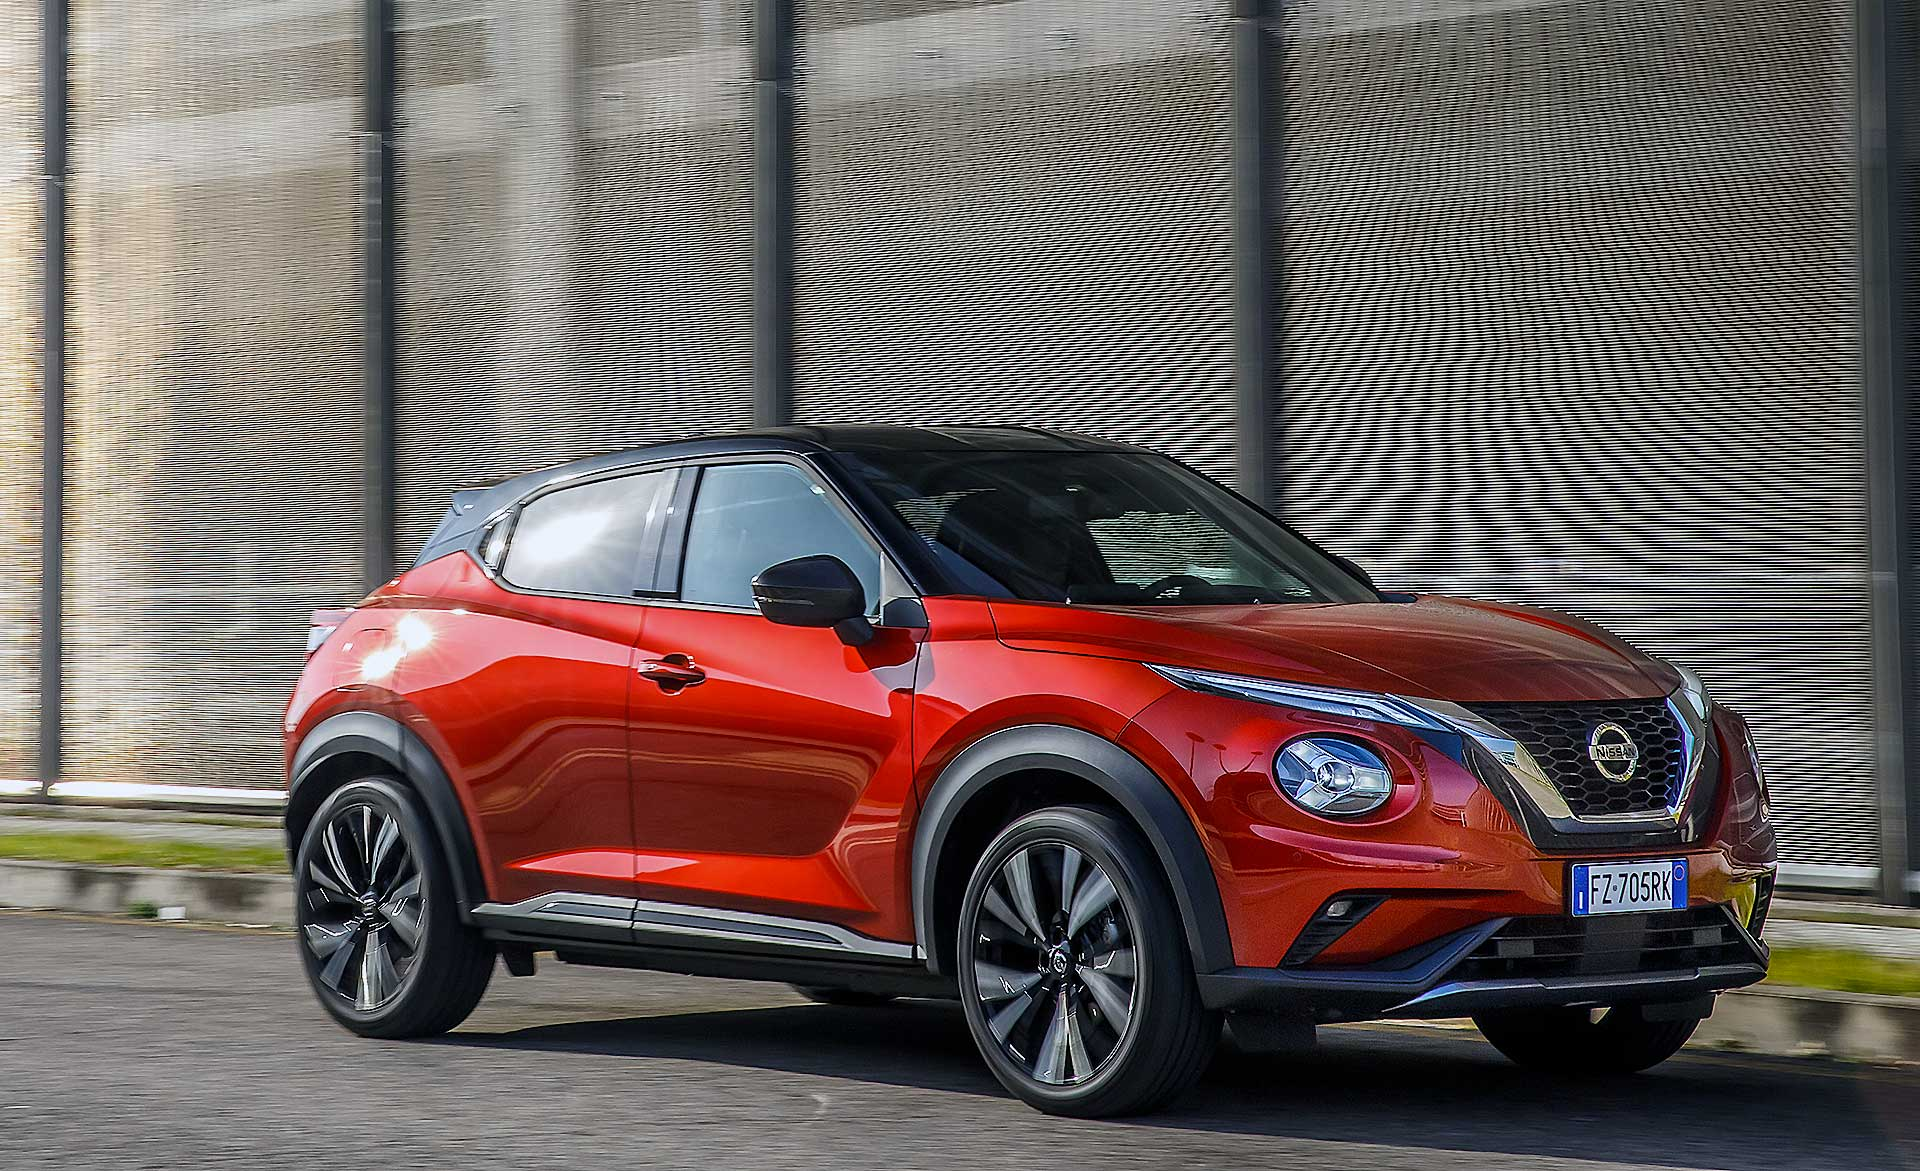 Nissan Juke 2020 arancione